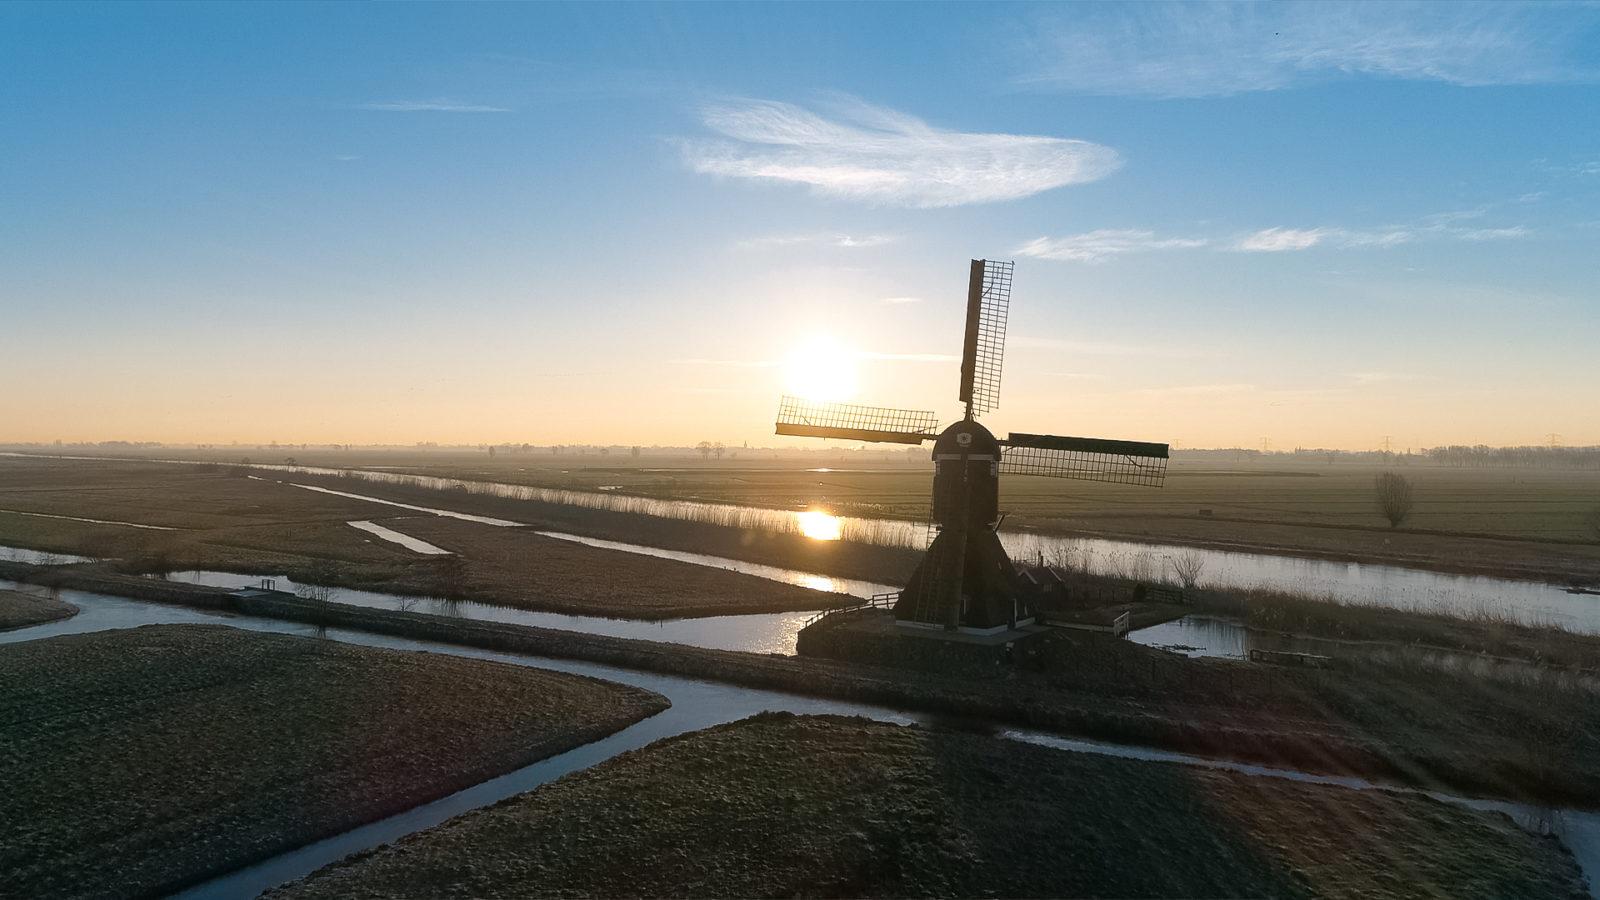 https://factandfable.nl//wp-content/uploads/2019/01/De-Molen-v2-2-1600x900.jpg